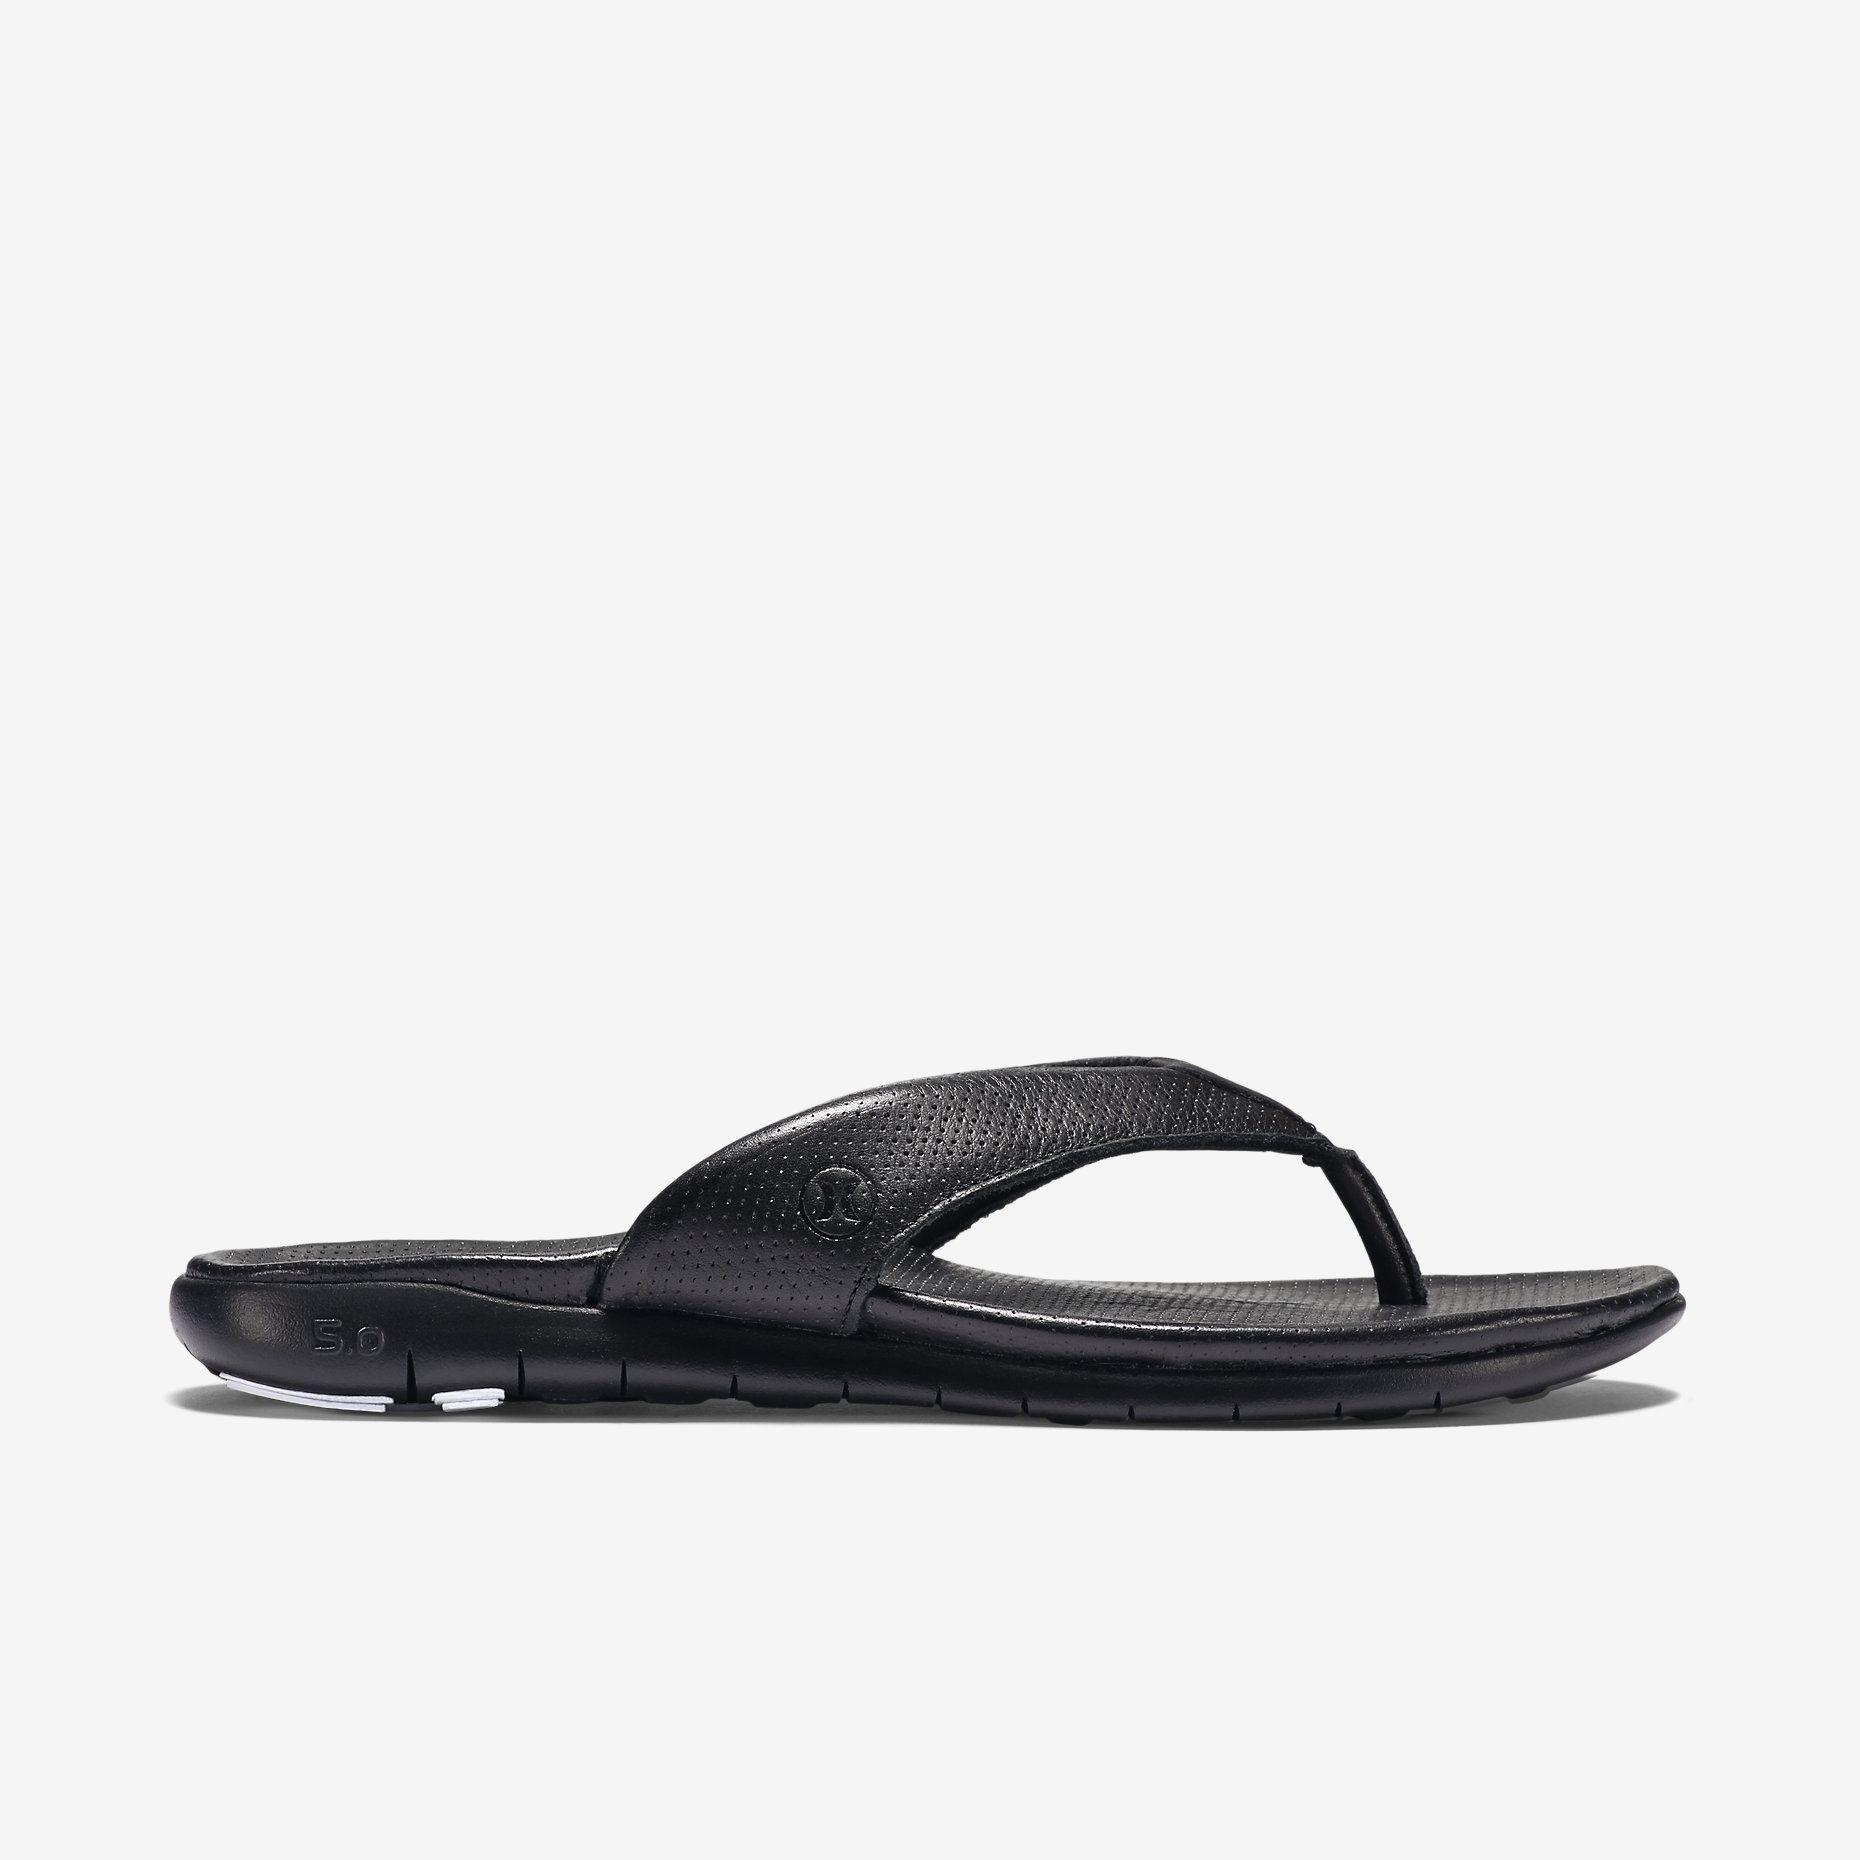 Nike Hurley Phantom Free (USA) Black Original Store